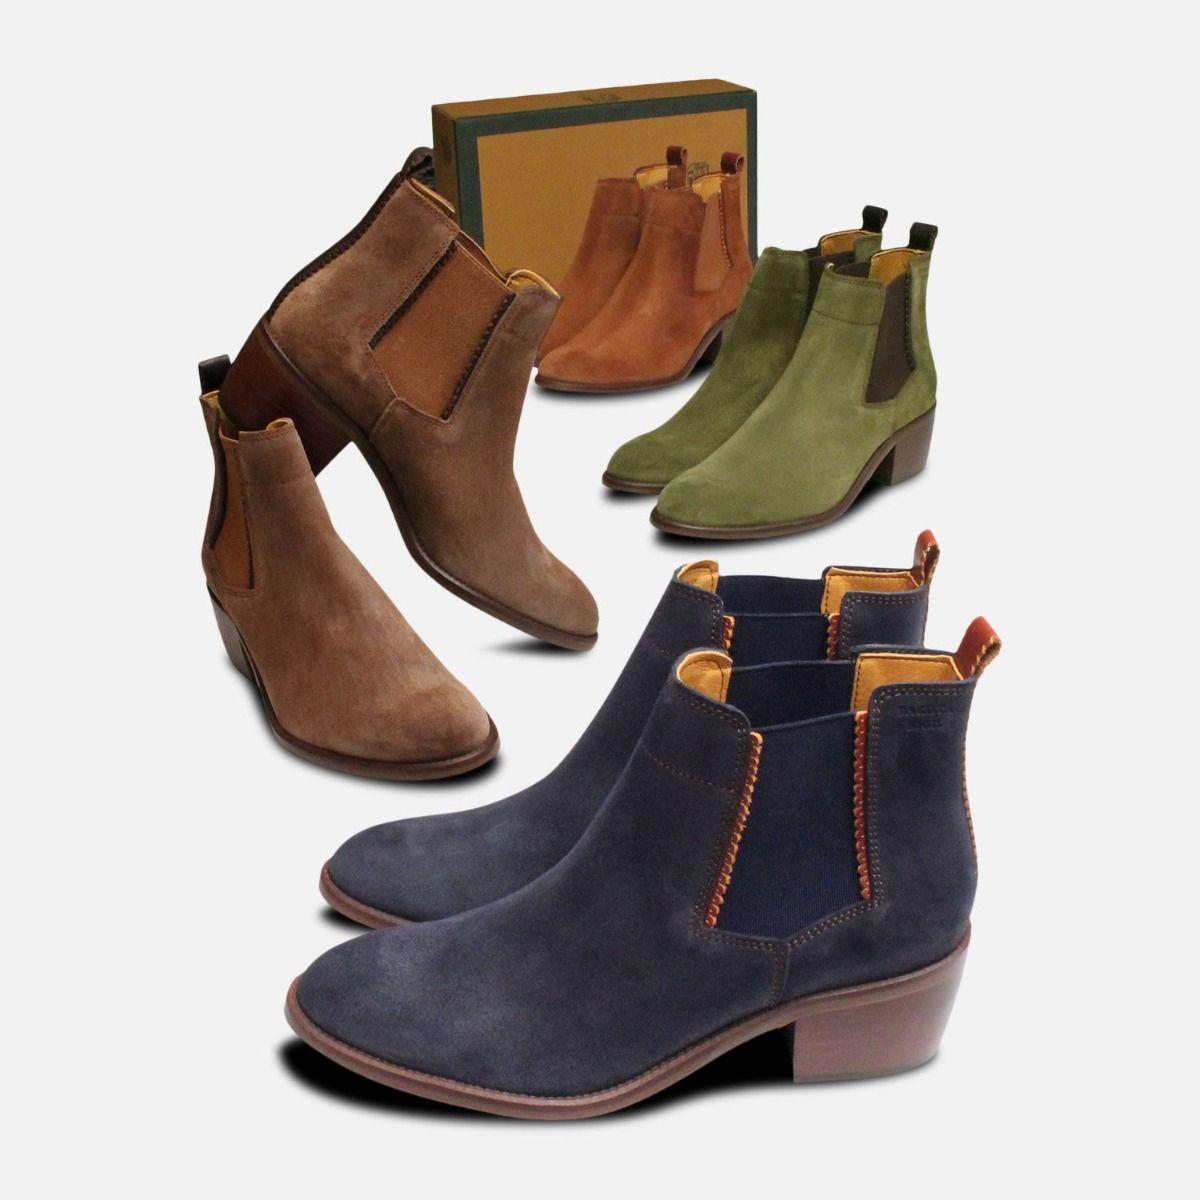 Cuban Heel Chelsea Boots in Moss Green